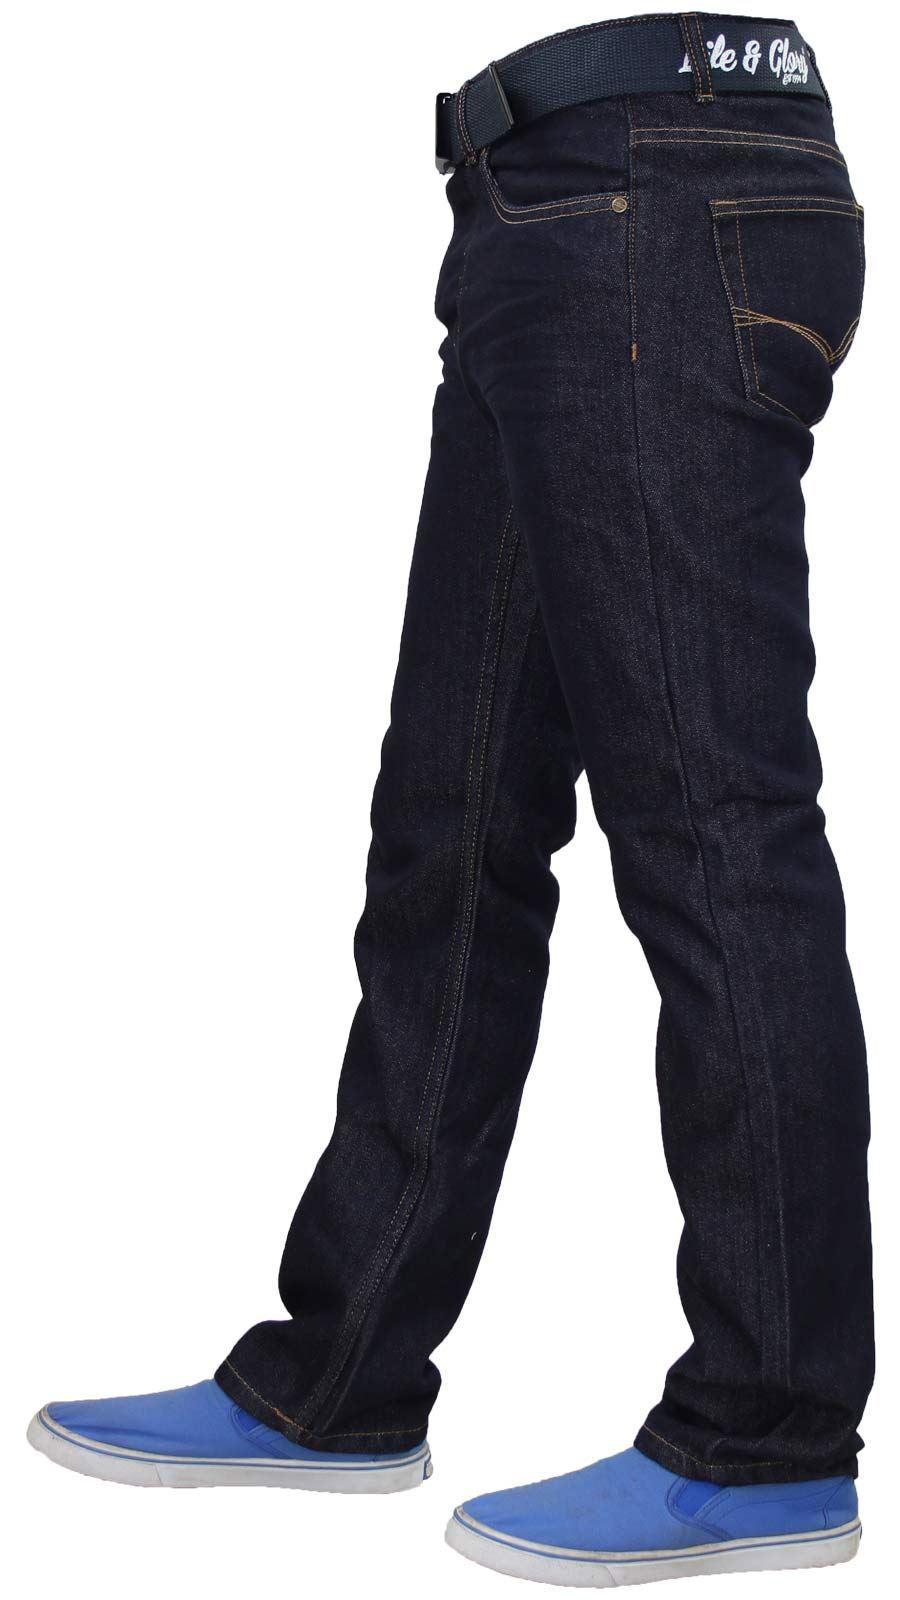 Mens-Regular-Fit-Jeans-Straight-Leg-Denim-Pants-Casual-Trousers-With-Free-Belt thumbnail 15